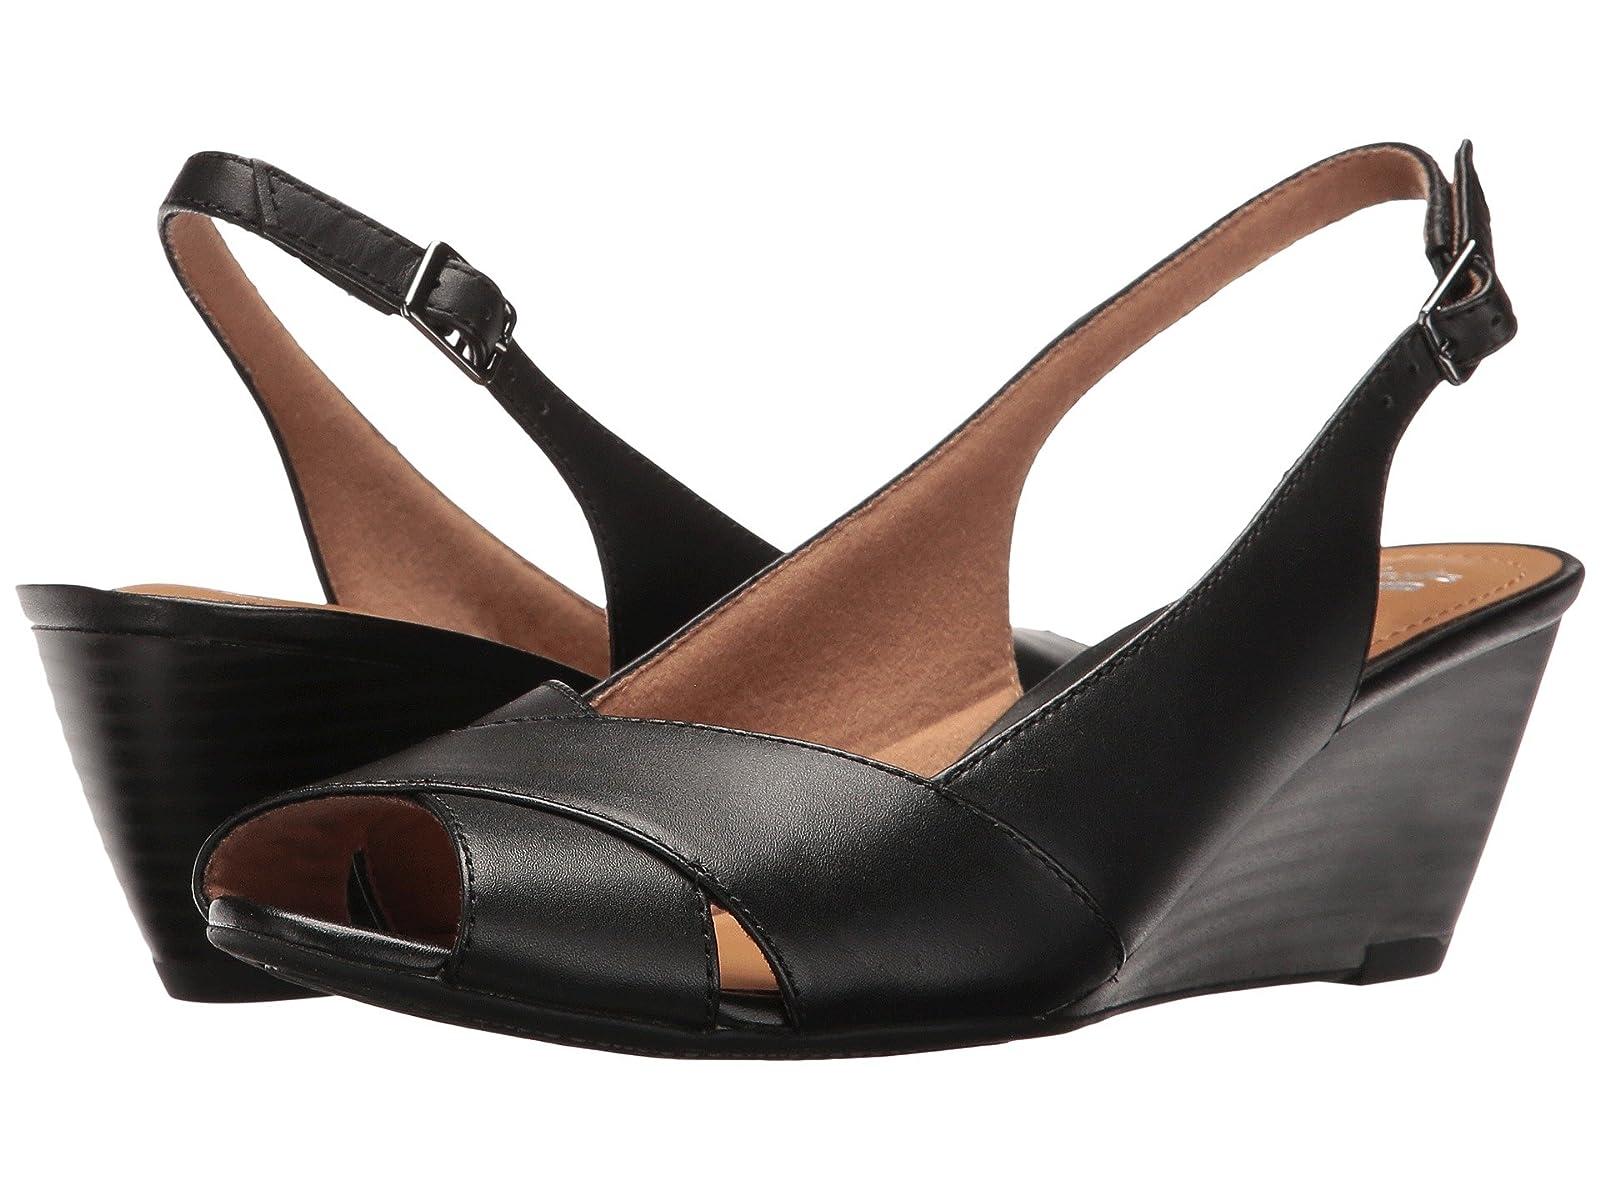 Clarks Brielle KaeCheap and distinctive eye-catching shoes